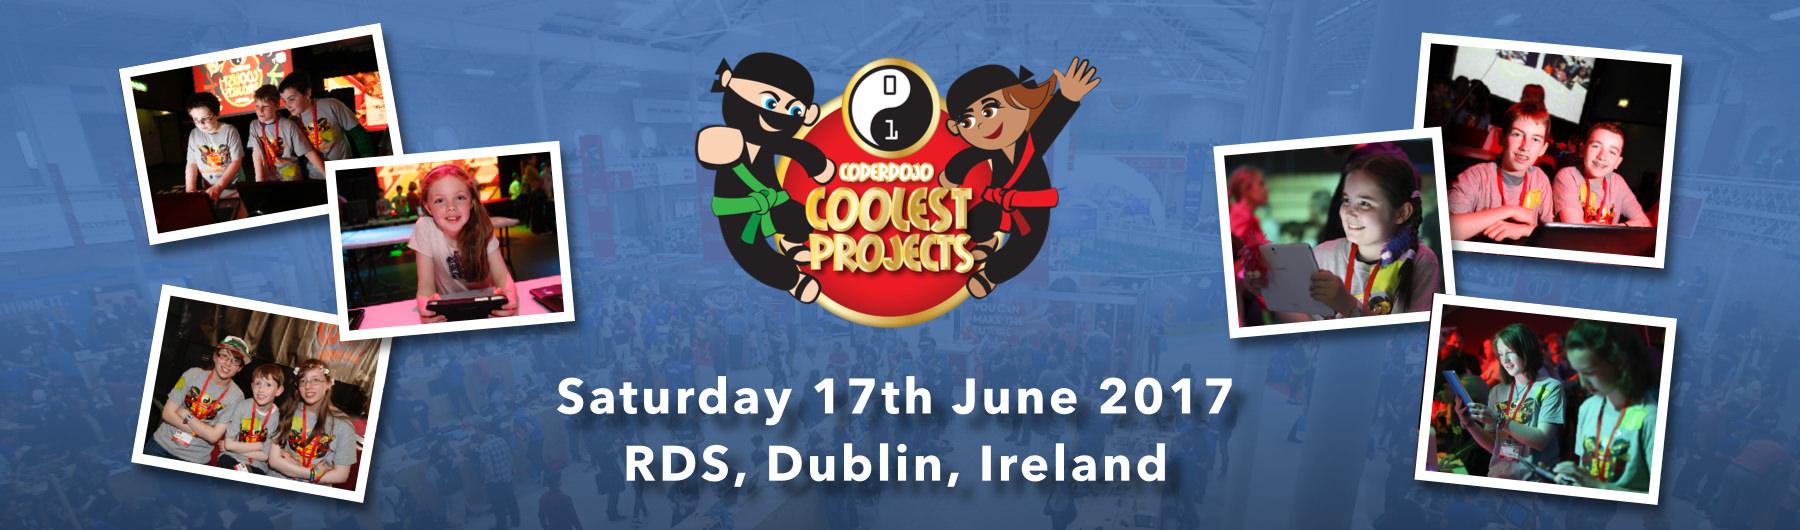 CoderDojo Coolest Projects Showcase 2017